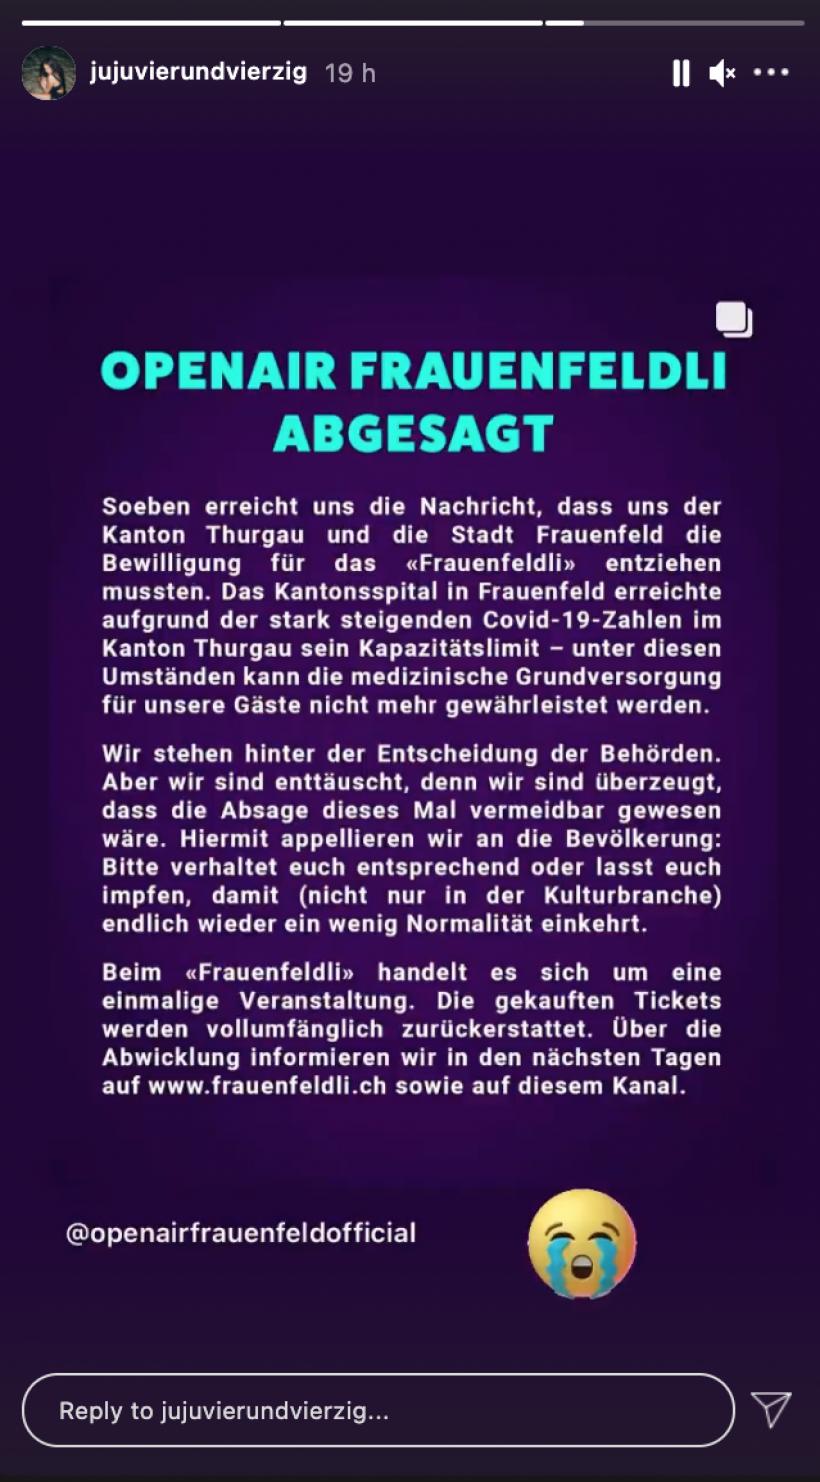 jujuvierundvierzig-Instagram-Story-01.09.2021.png